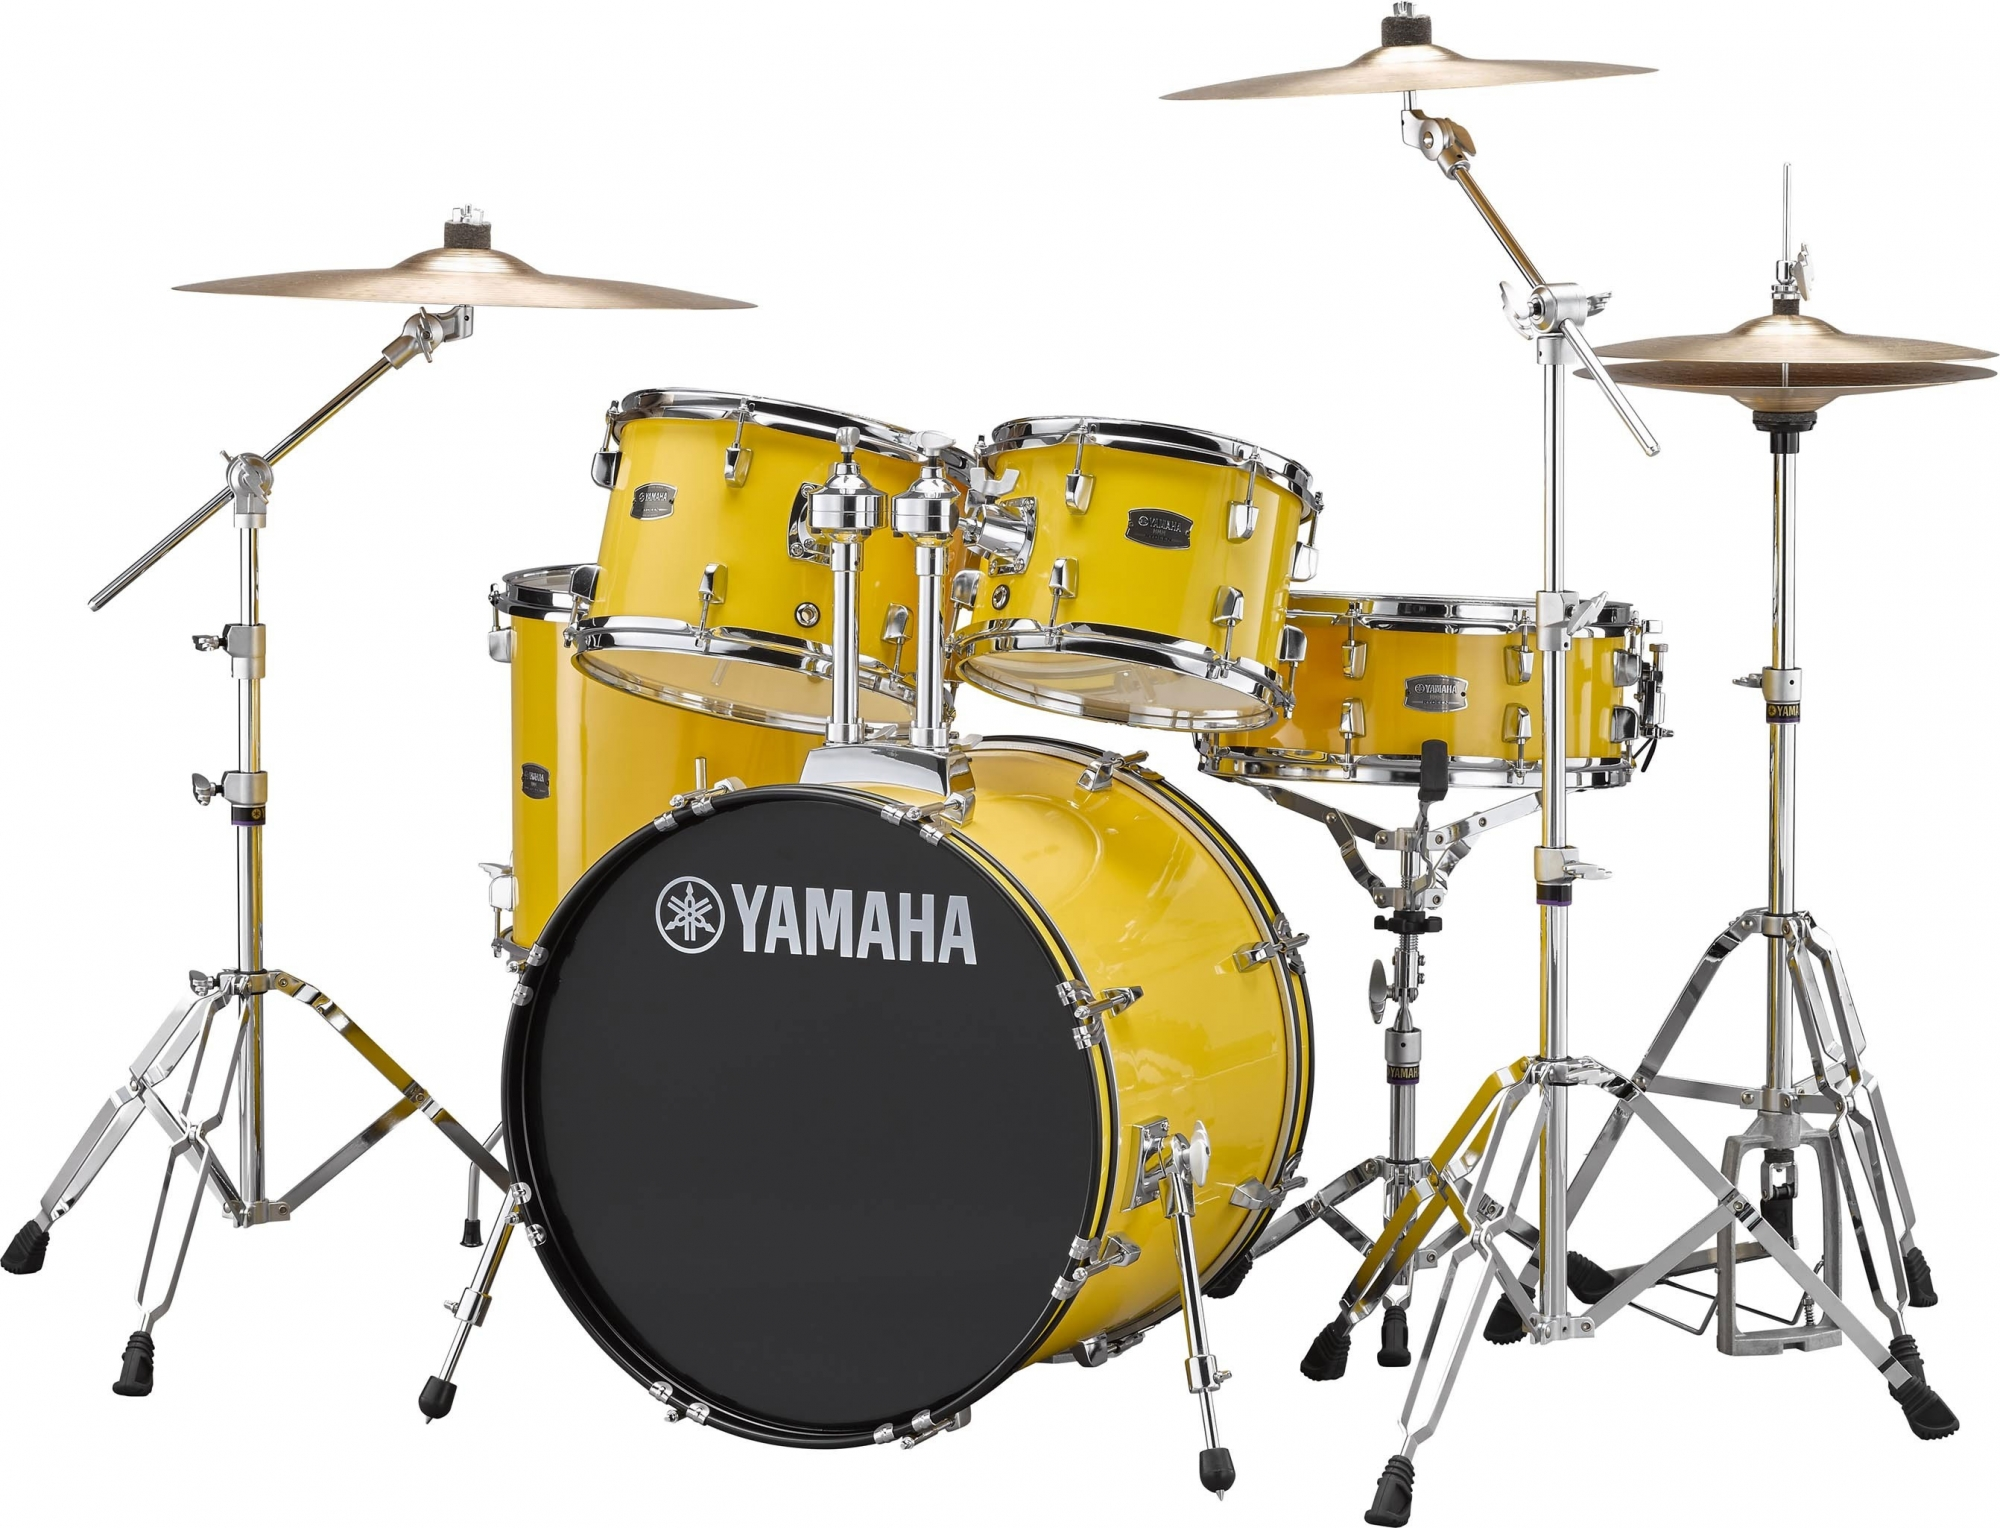 Yamaha RYDEEN Studio Trommesæt - inkl. bækkener & hardware Mellow Yellow